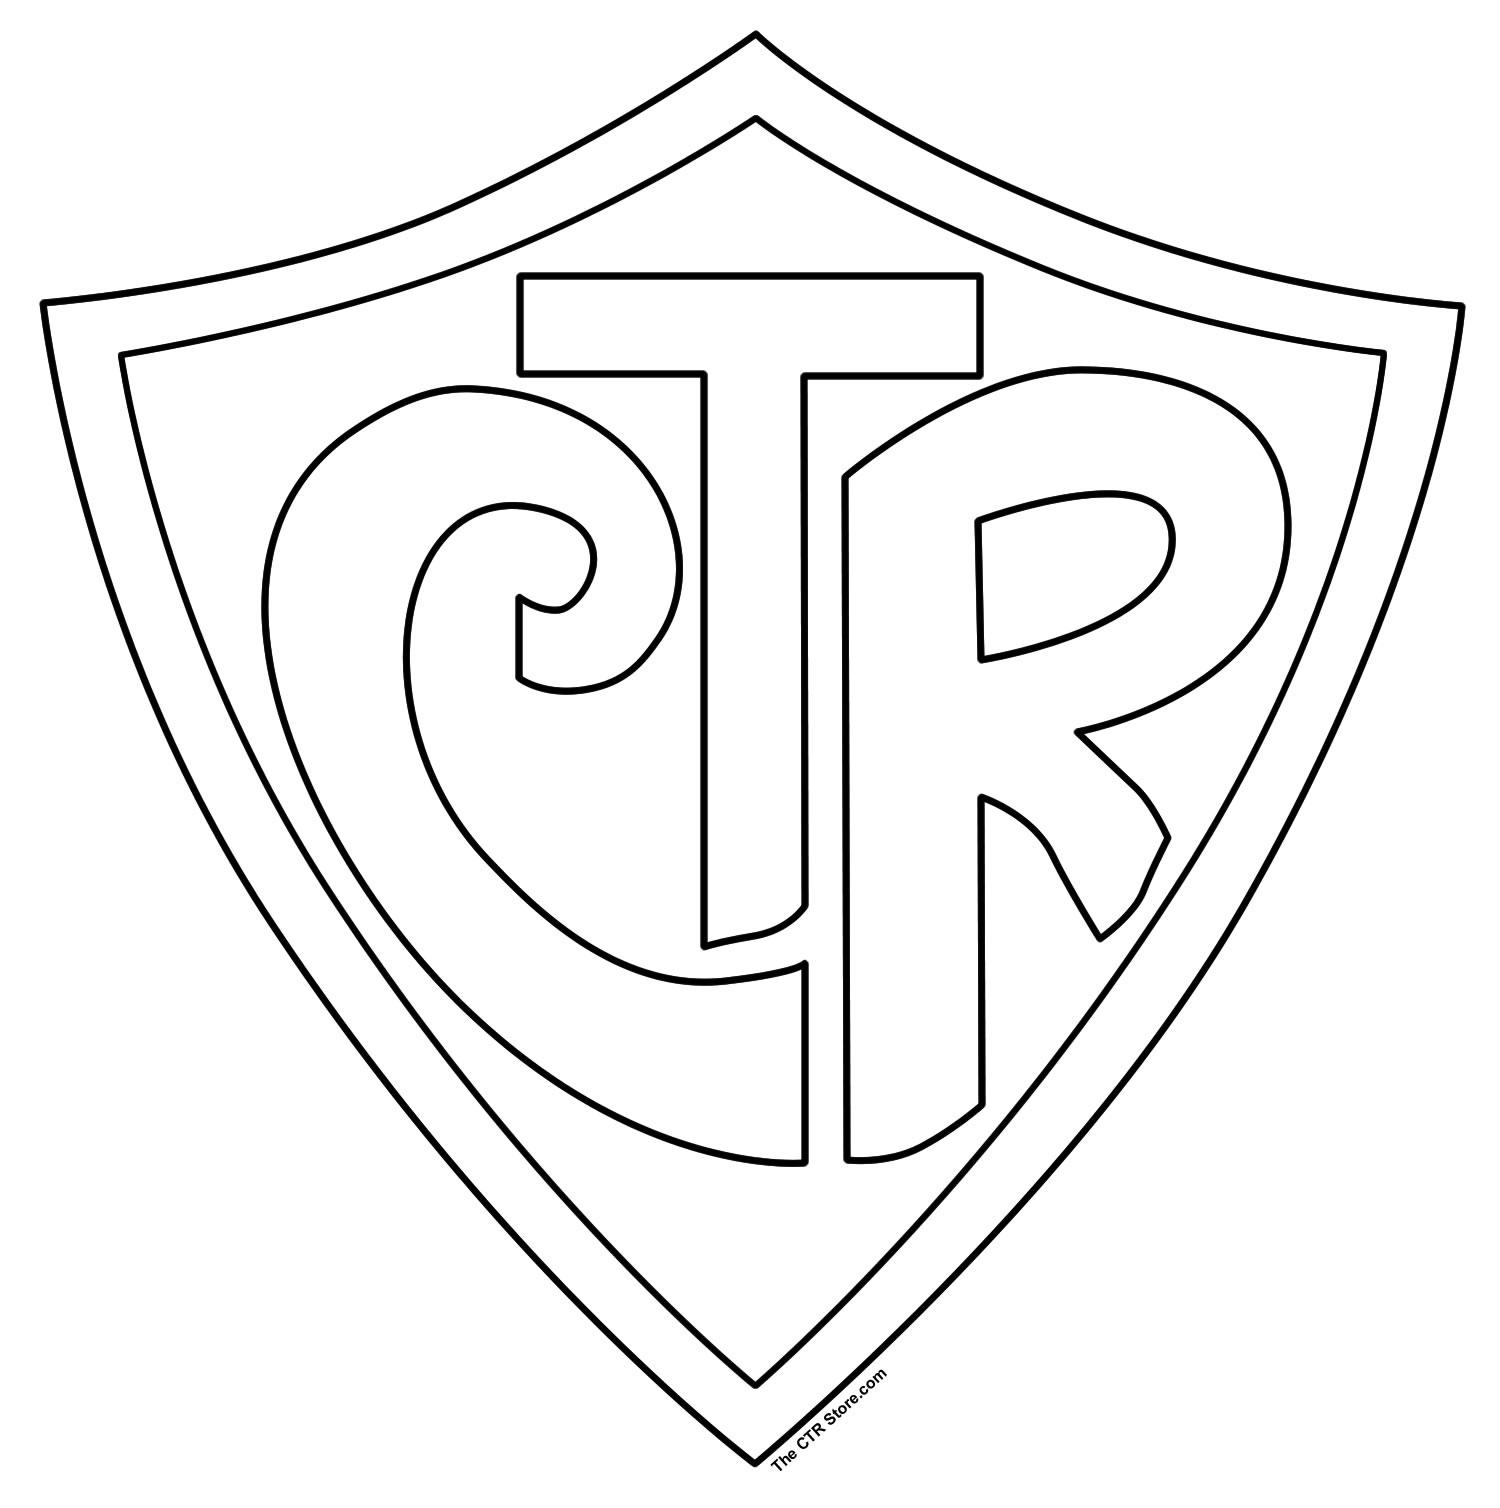 Lds clipart logo. Free ctr shield printable